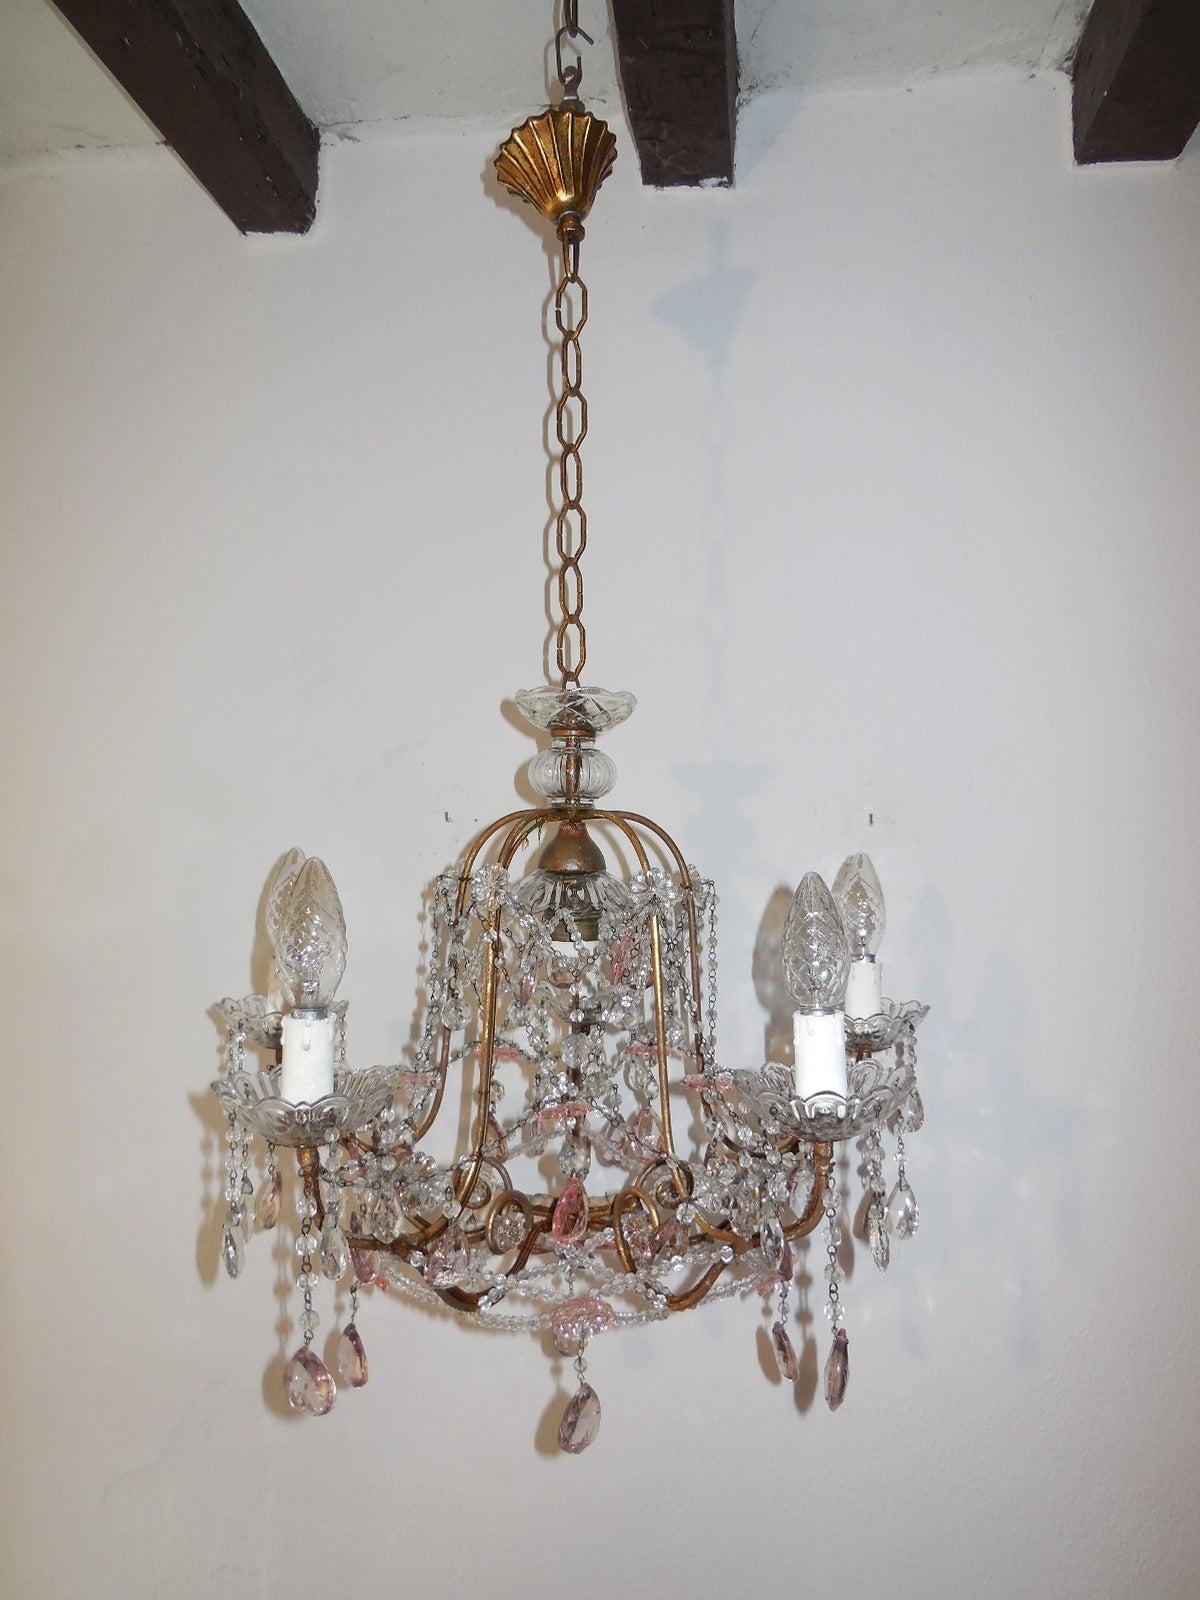 1920 French Feminine Pink Crystal Prisms Chandelier For